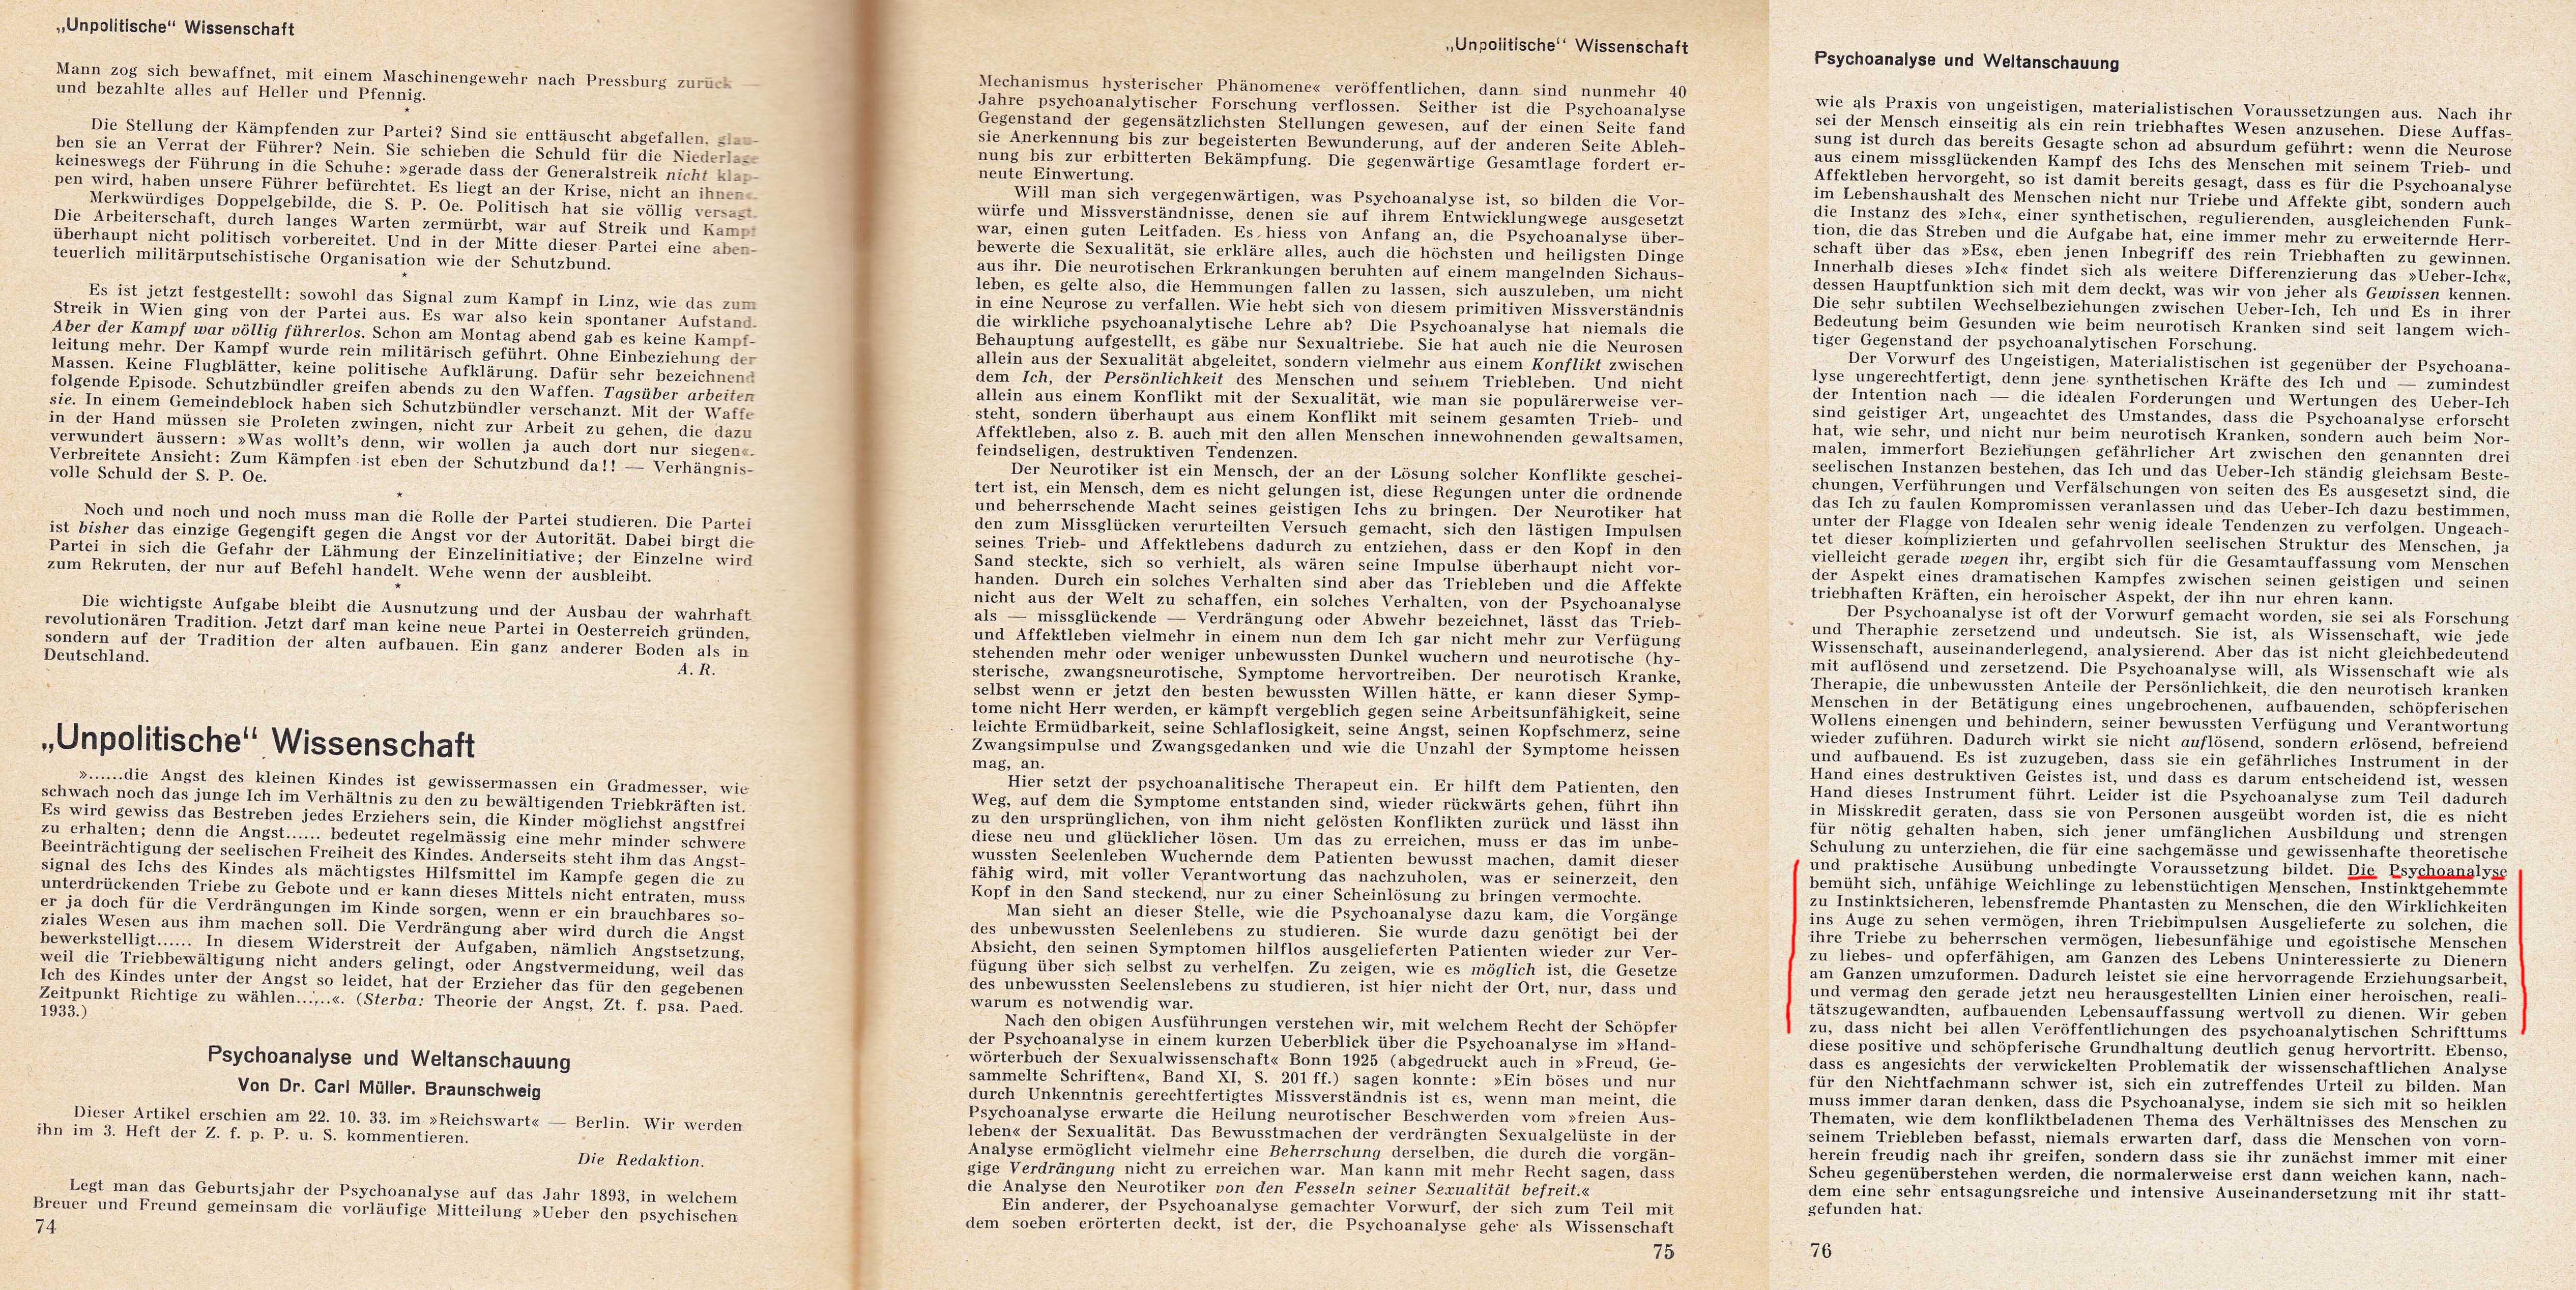 Memorandum 1933 in ZPPS